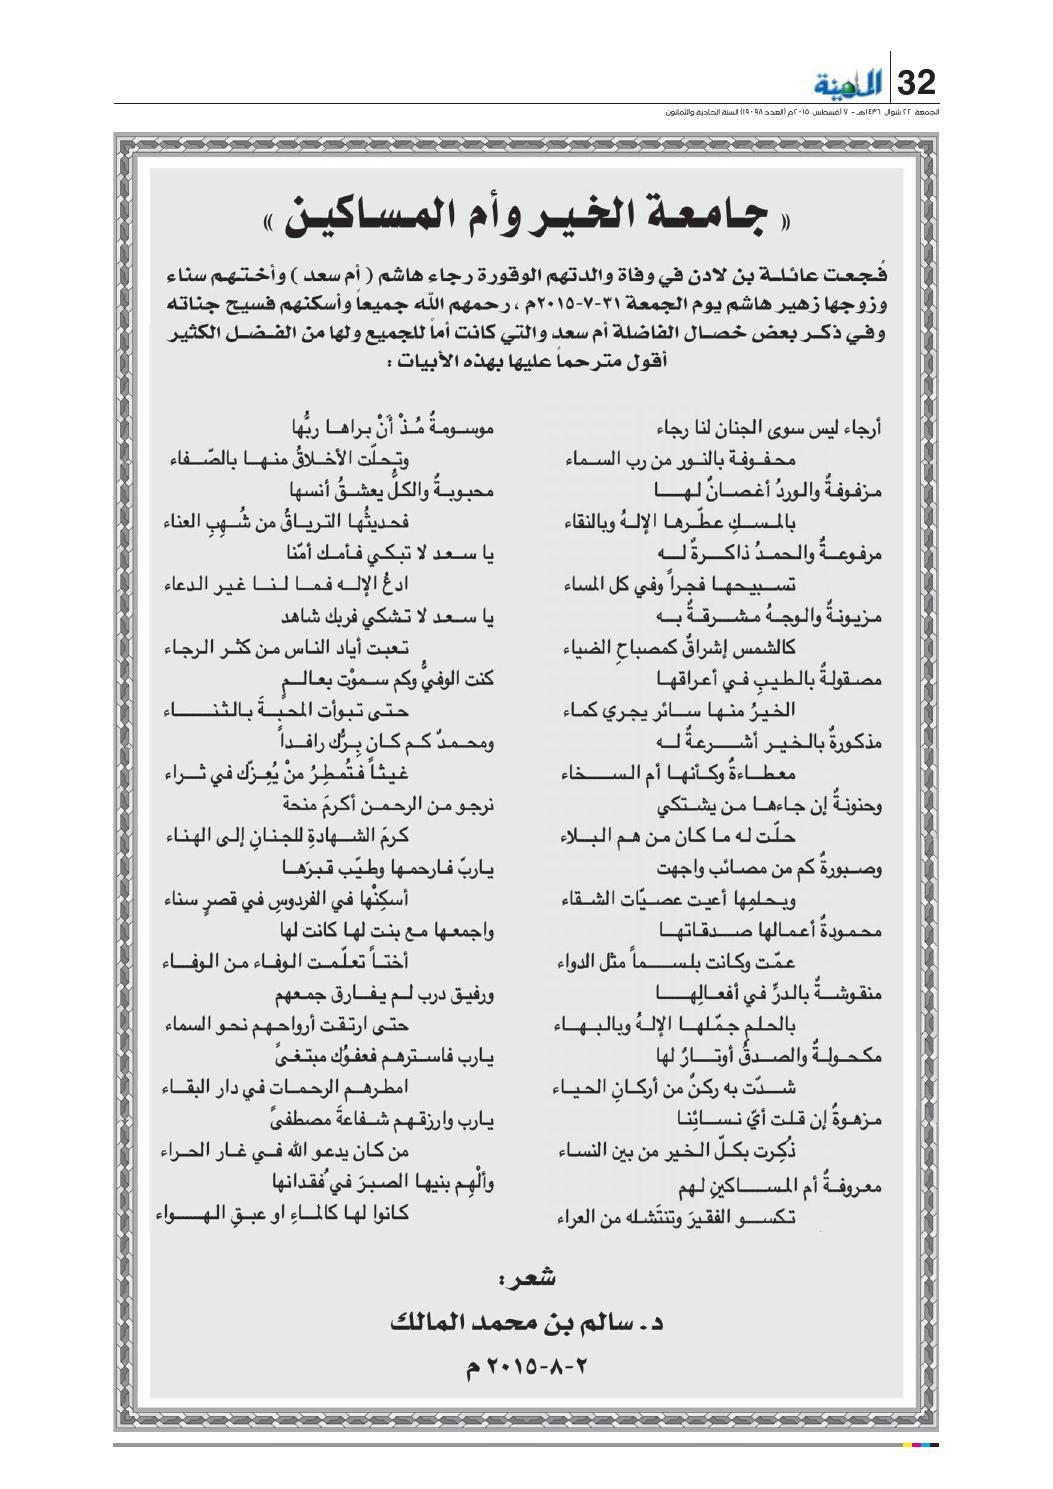 9976fd3f49e58 Madina 20150807 by Al-Madina Newspaper - issuu